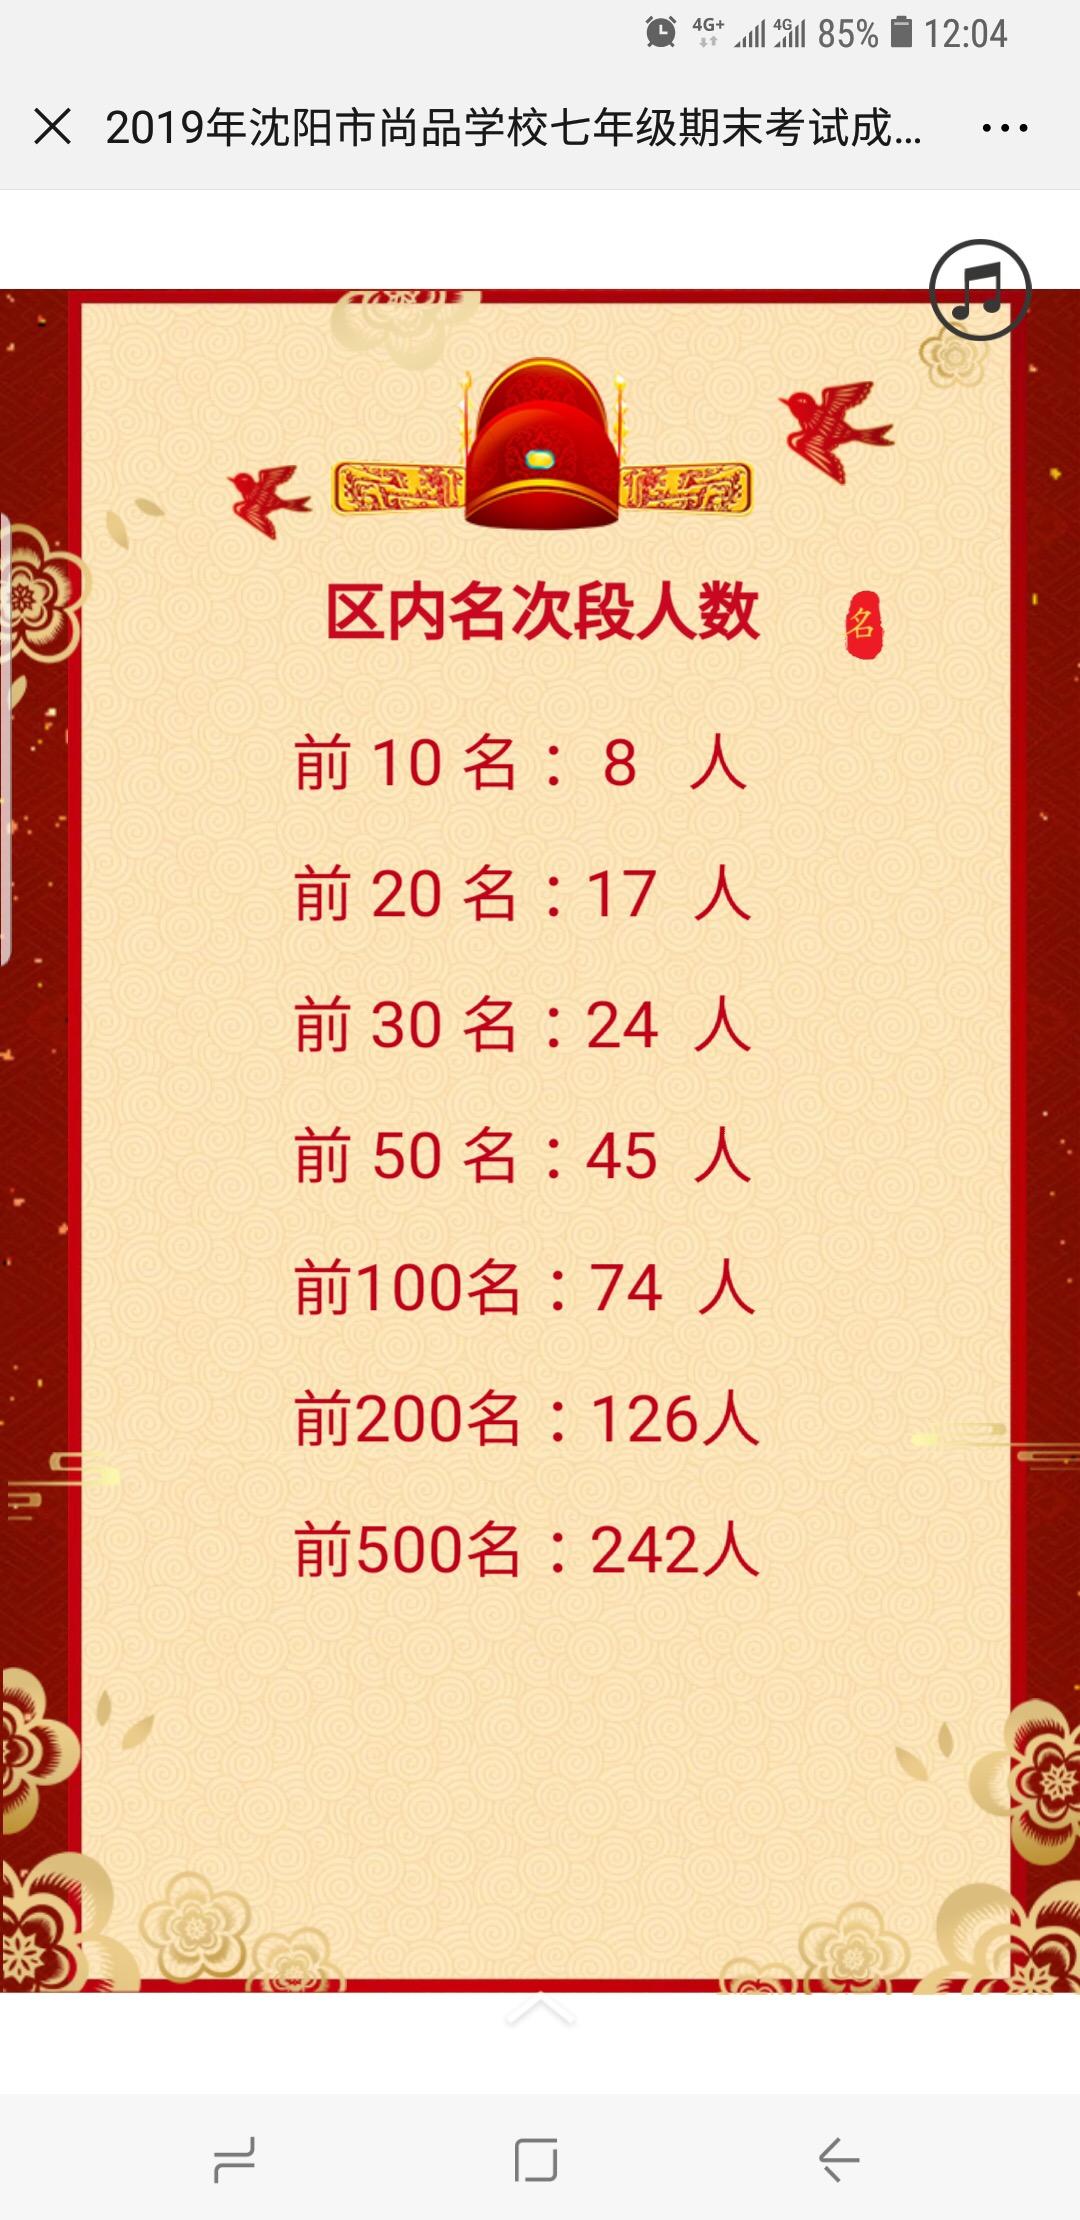 EC609DBD-EE95-4638-8E17-C4F305C185E2.jpg